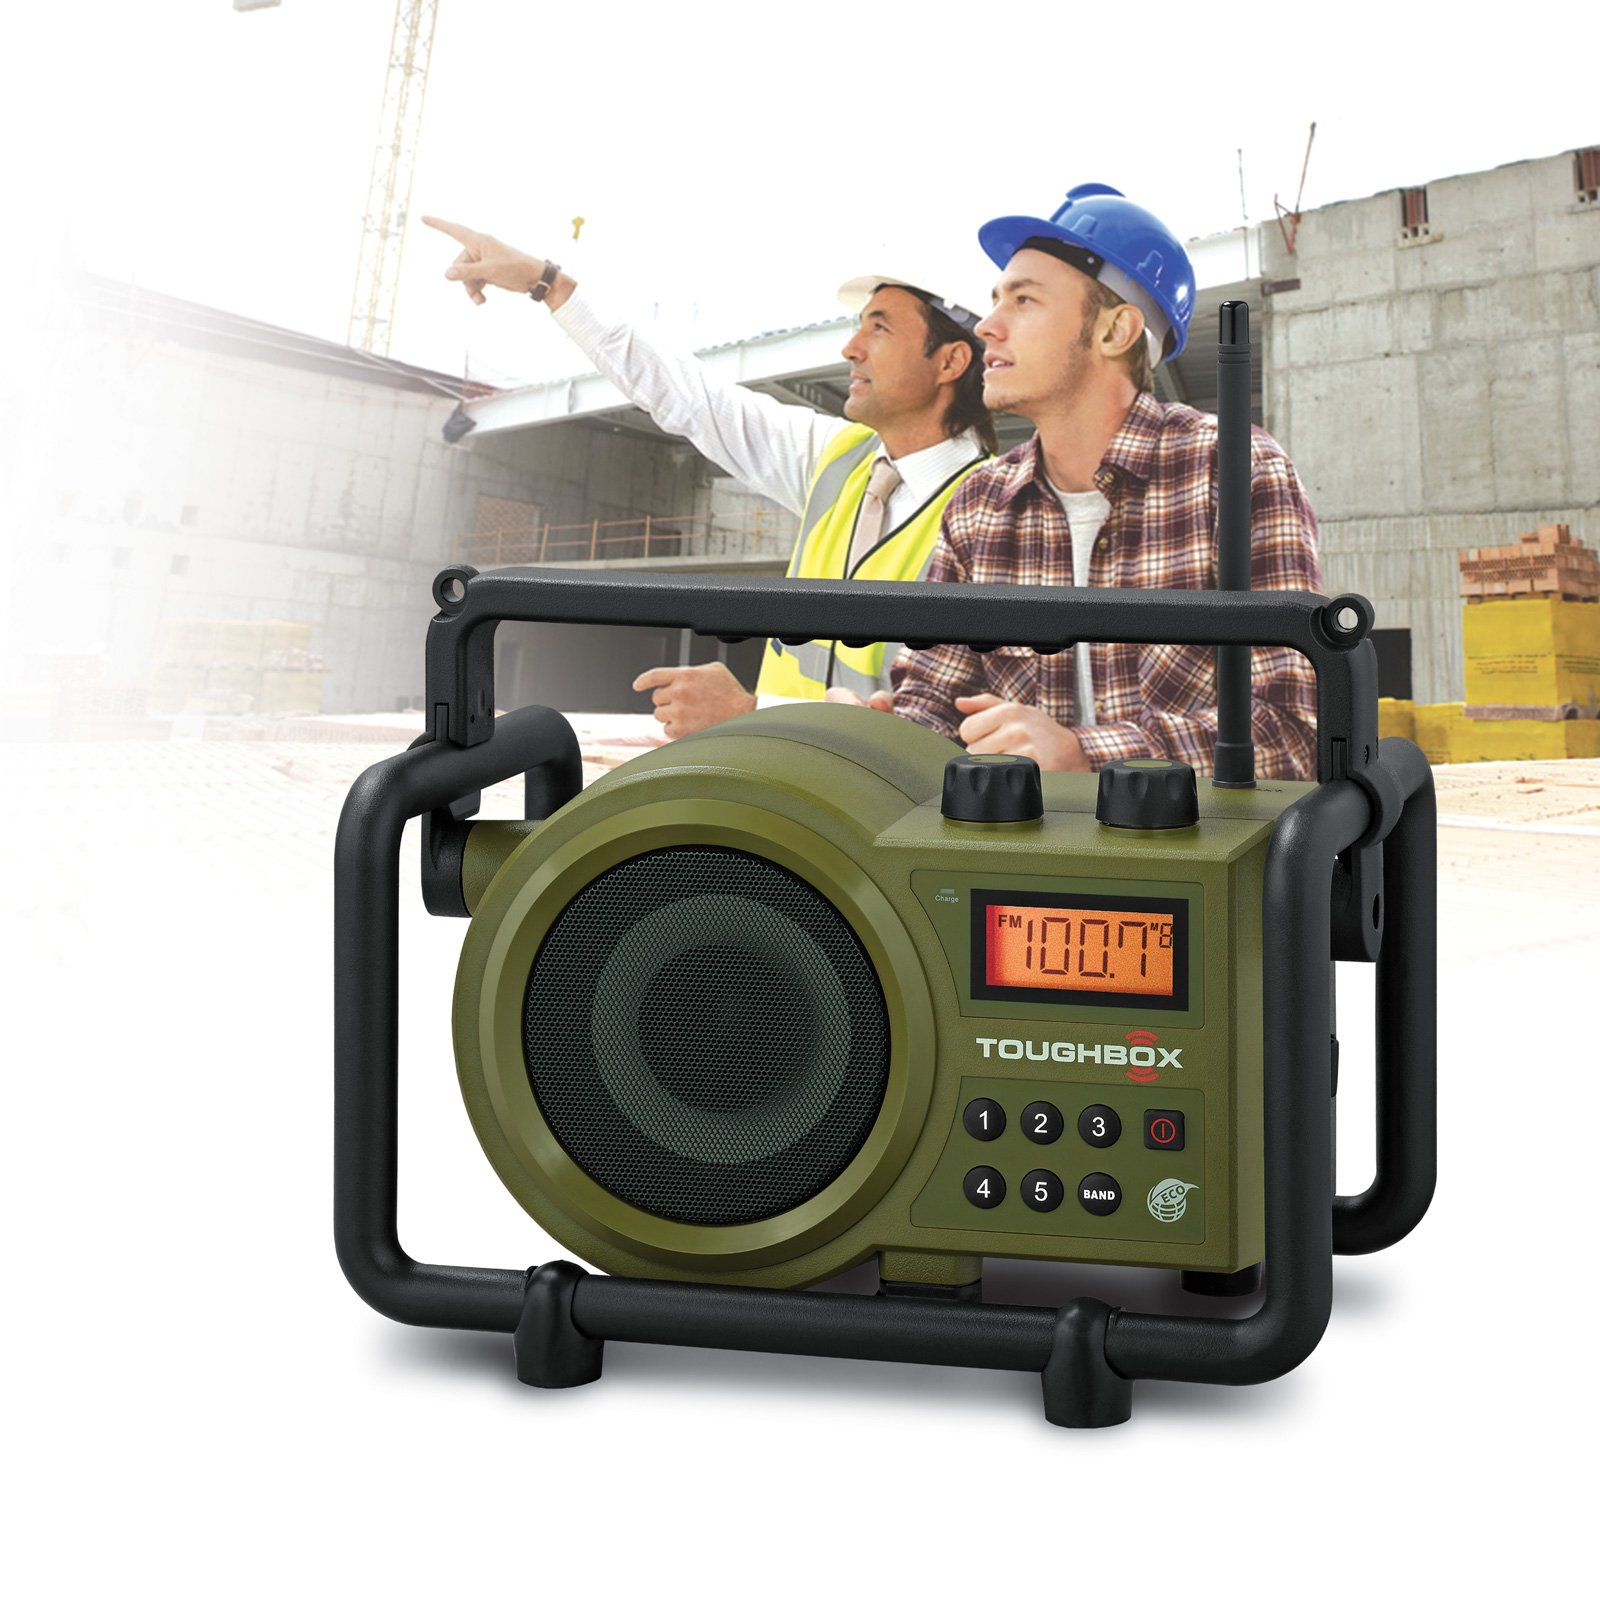 Sangean TB100 Toughbox Rugged Digital Radio Rechargabl